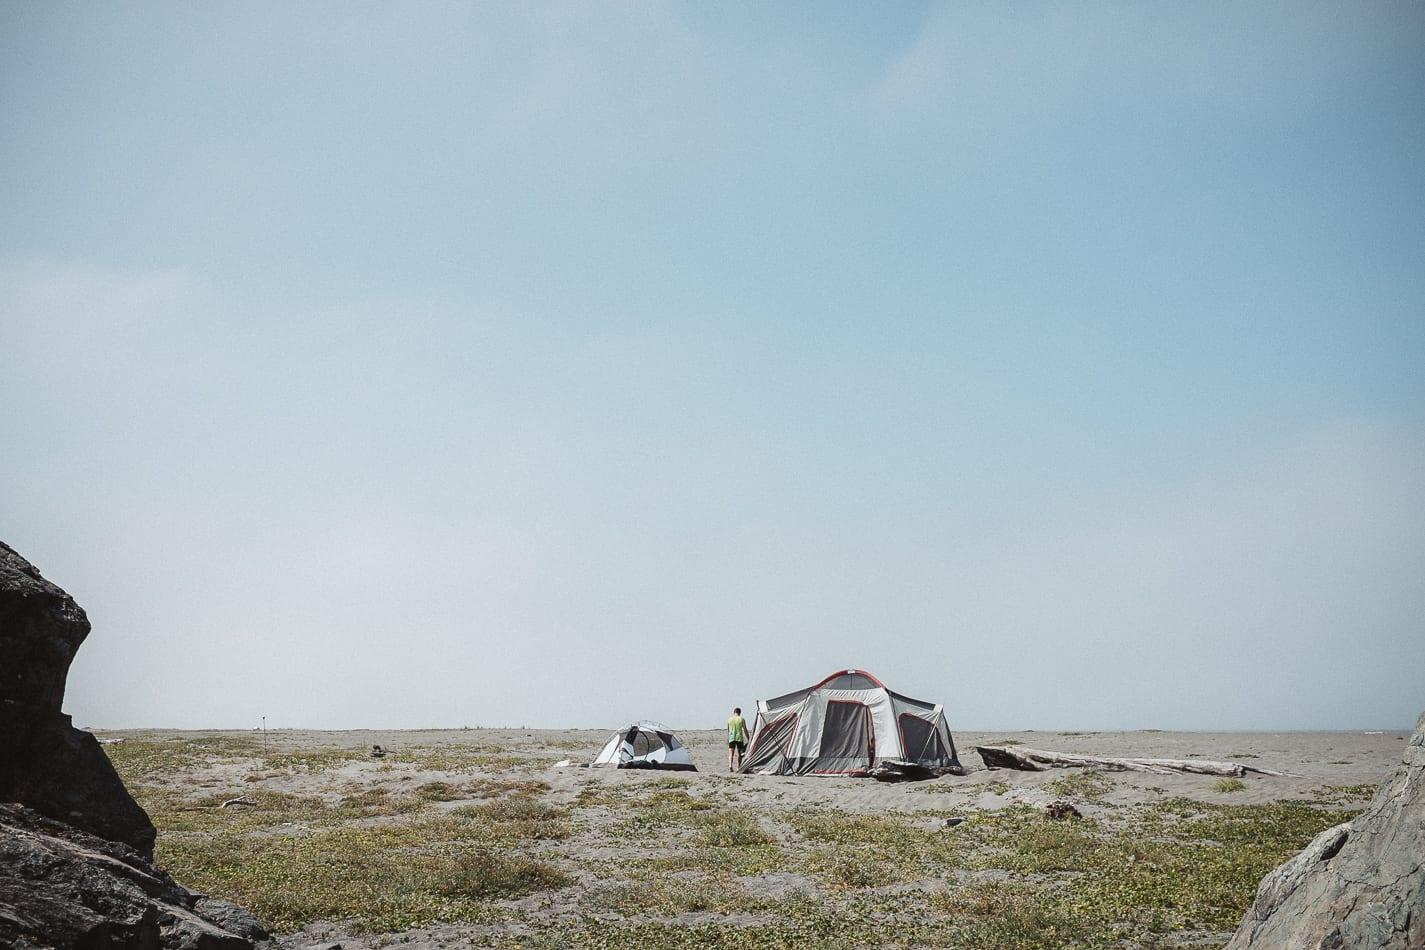 patricks-point-beach-camping-california-adventure-photographer-22